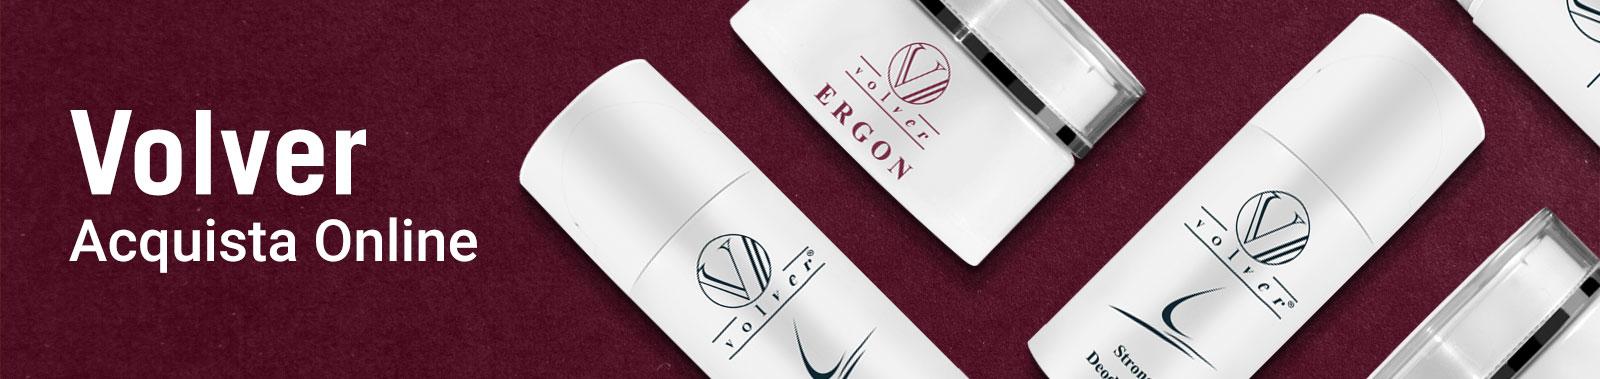 Linea Volver Sice Eubiotica per la pelle maschile, Acquista Online